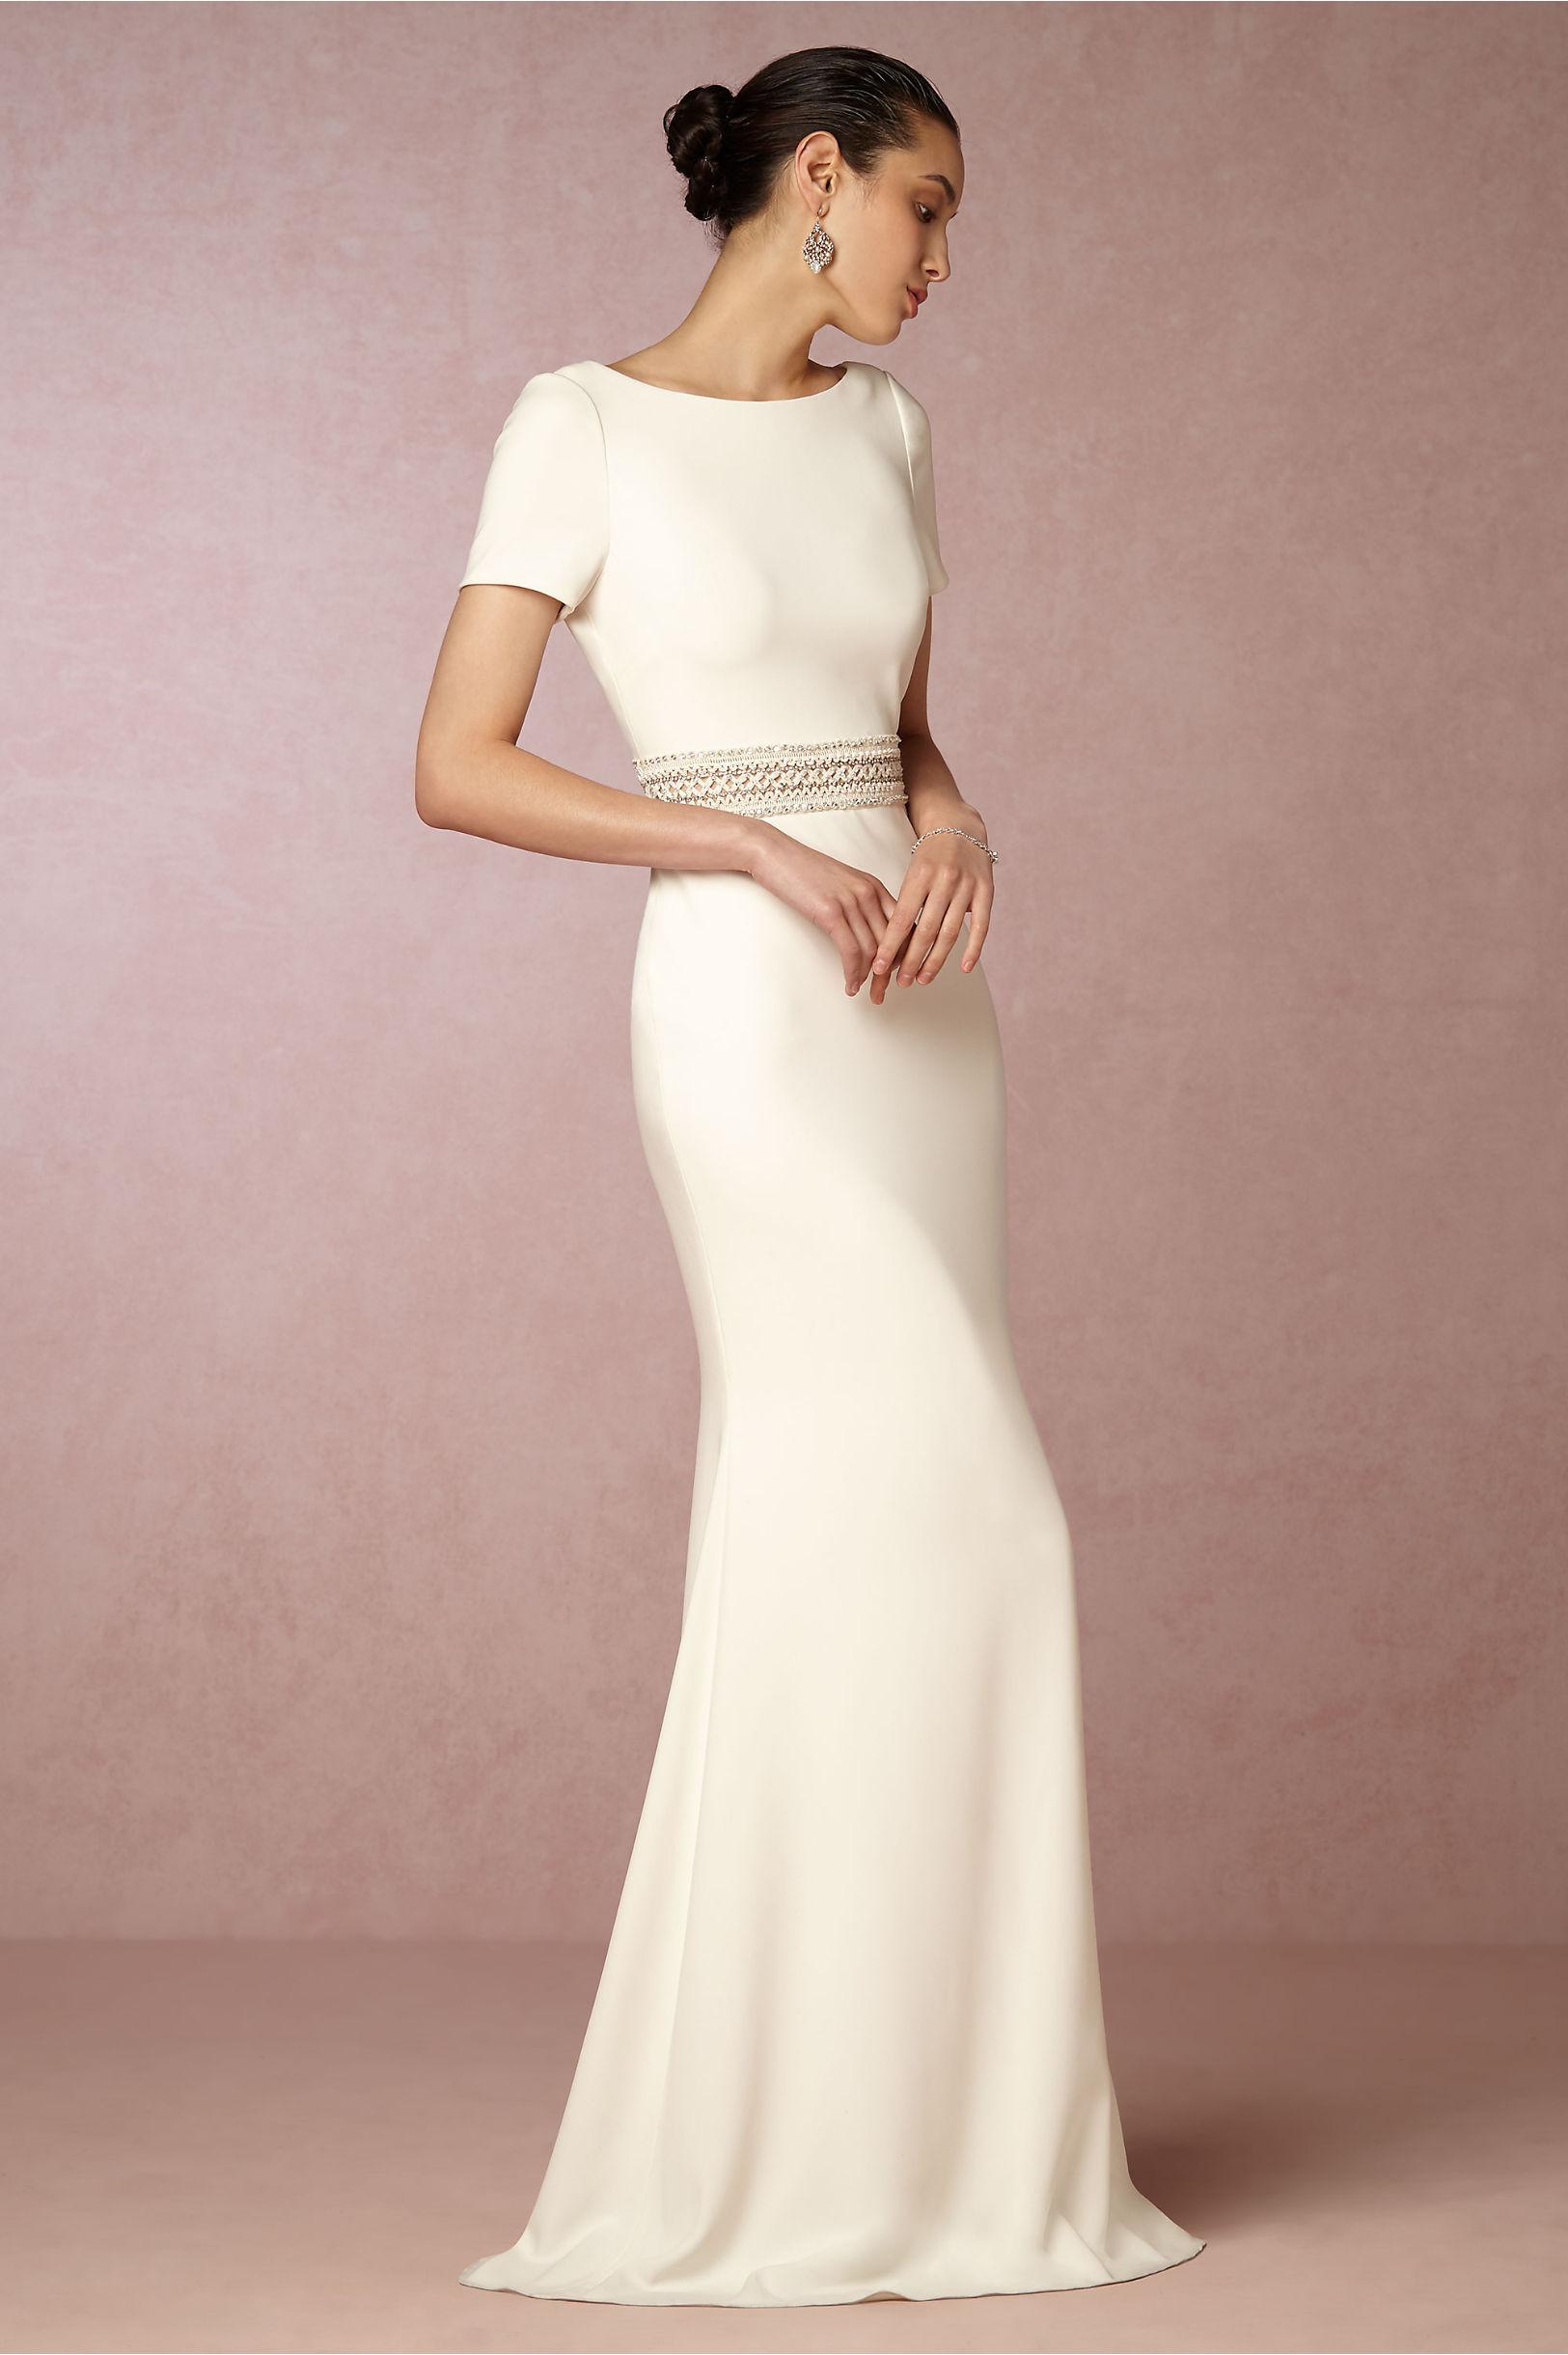 shop sale borrow wedding dress Alice Gown